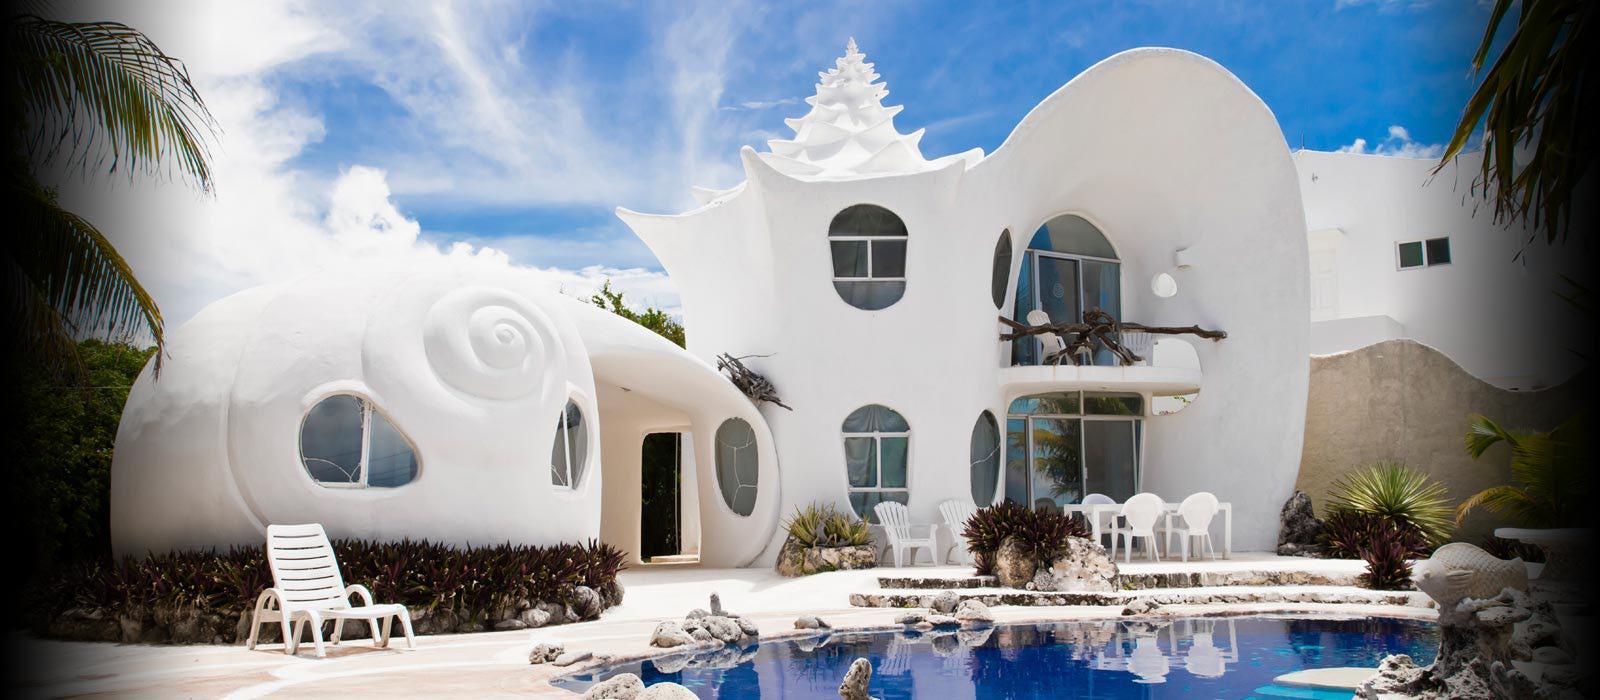 travel photos airbnb alternatives vacation home rentals image